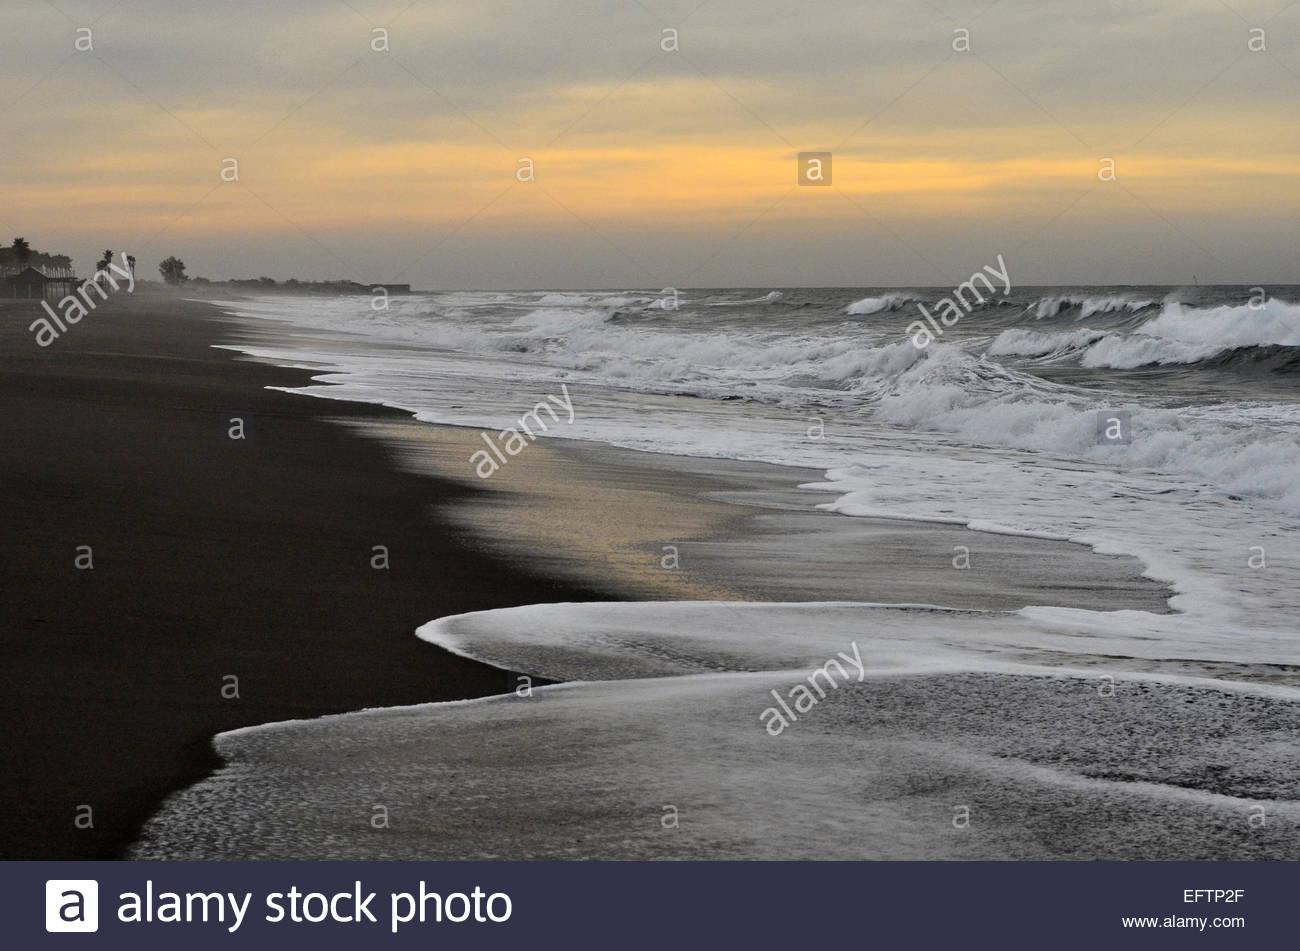 Rainy overcast winter morning beach Mediterranean coast Almeria Southern Spain Europe - Stock Image